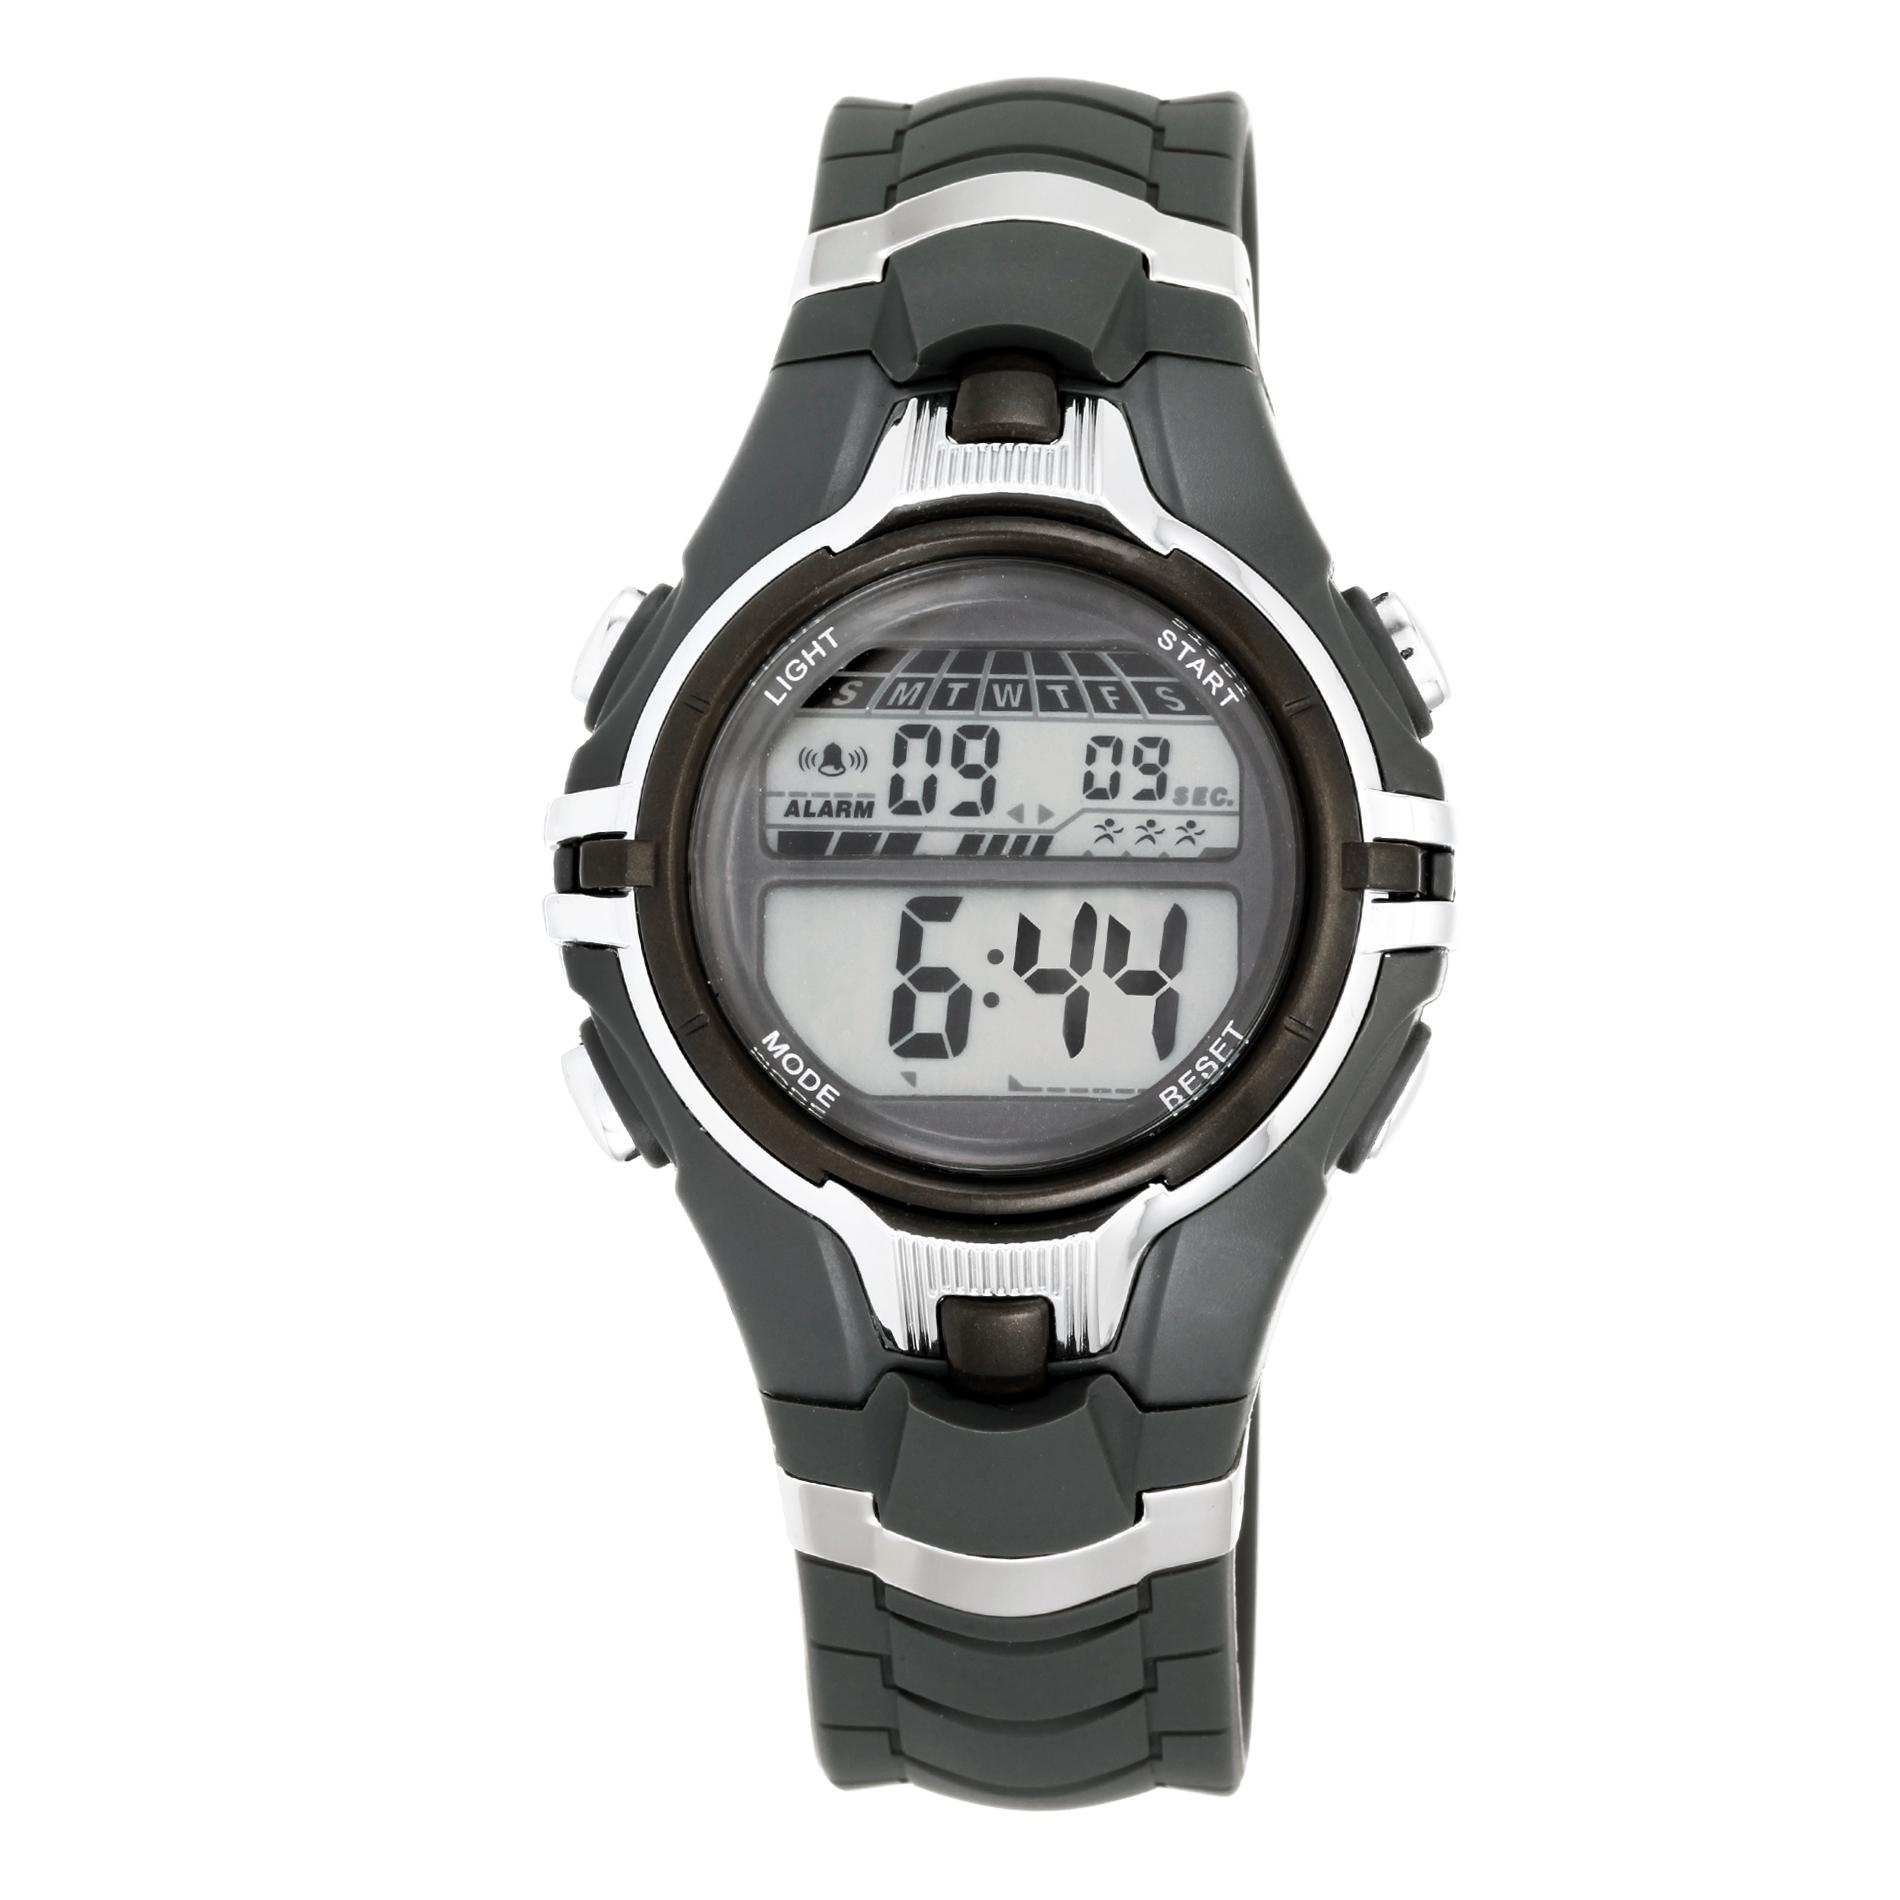 Men's Digital Strap Watch, gray